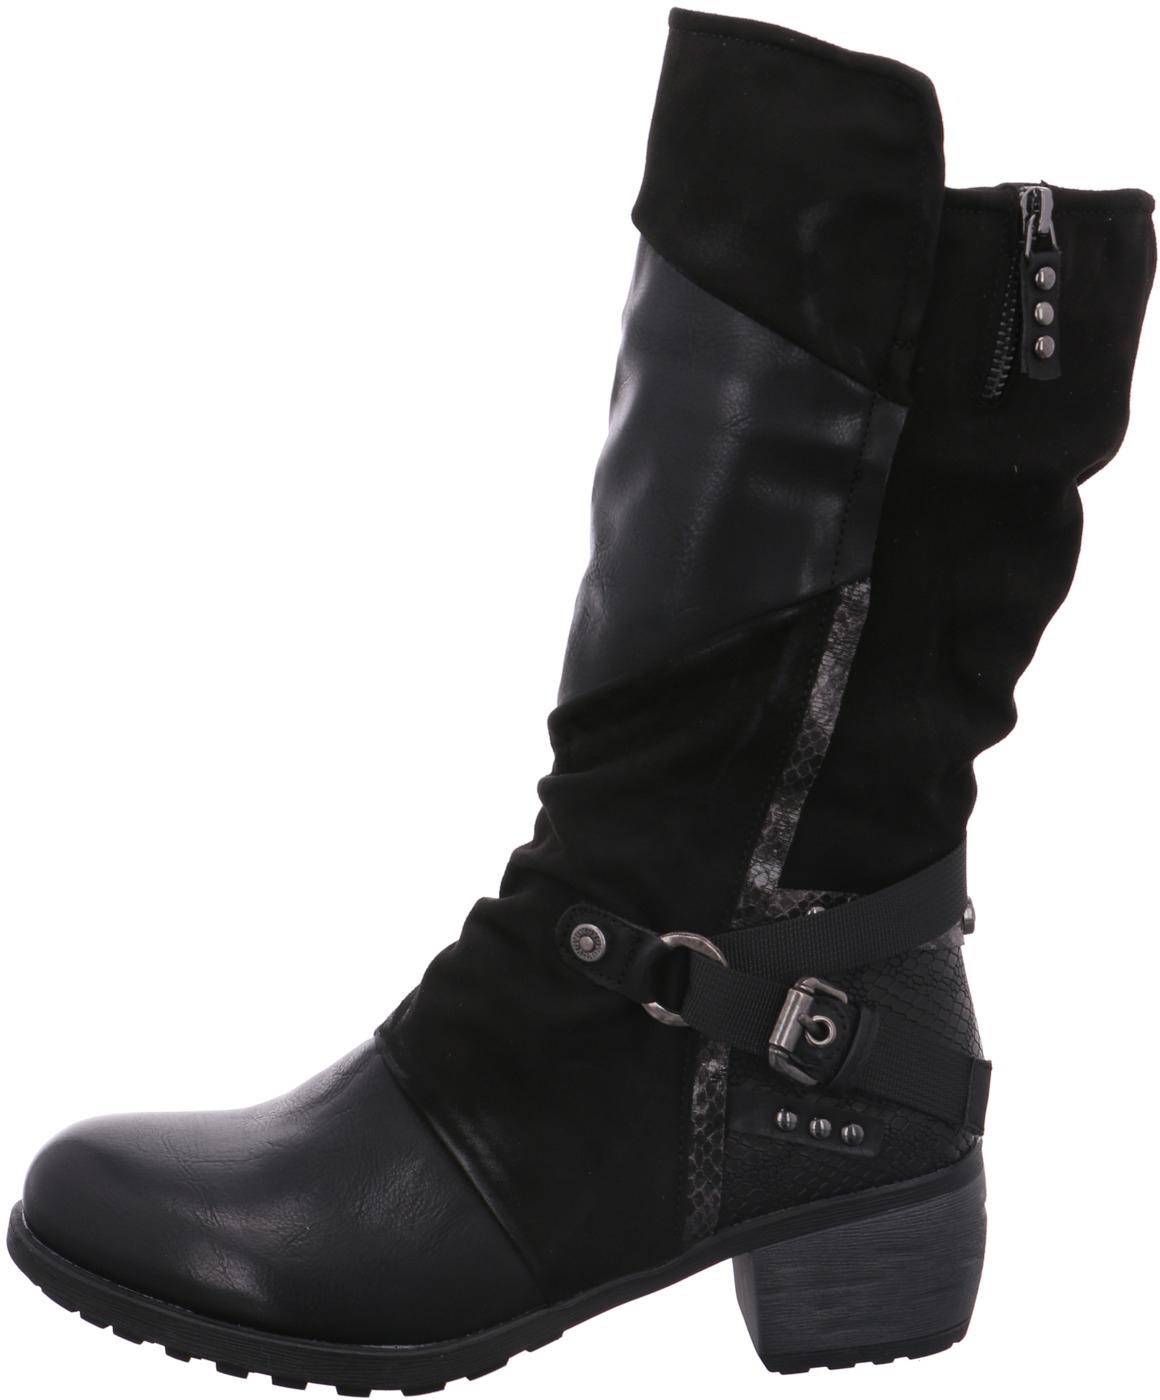 HW200906 Black